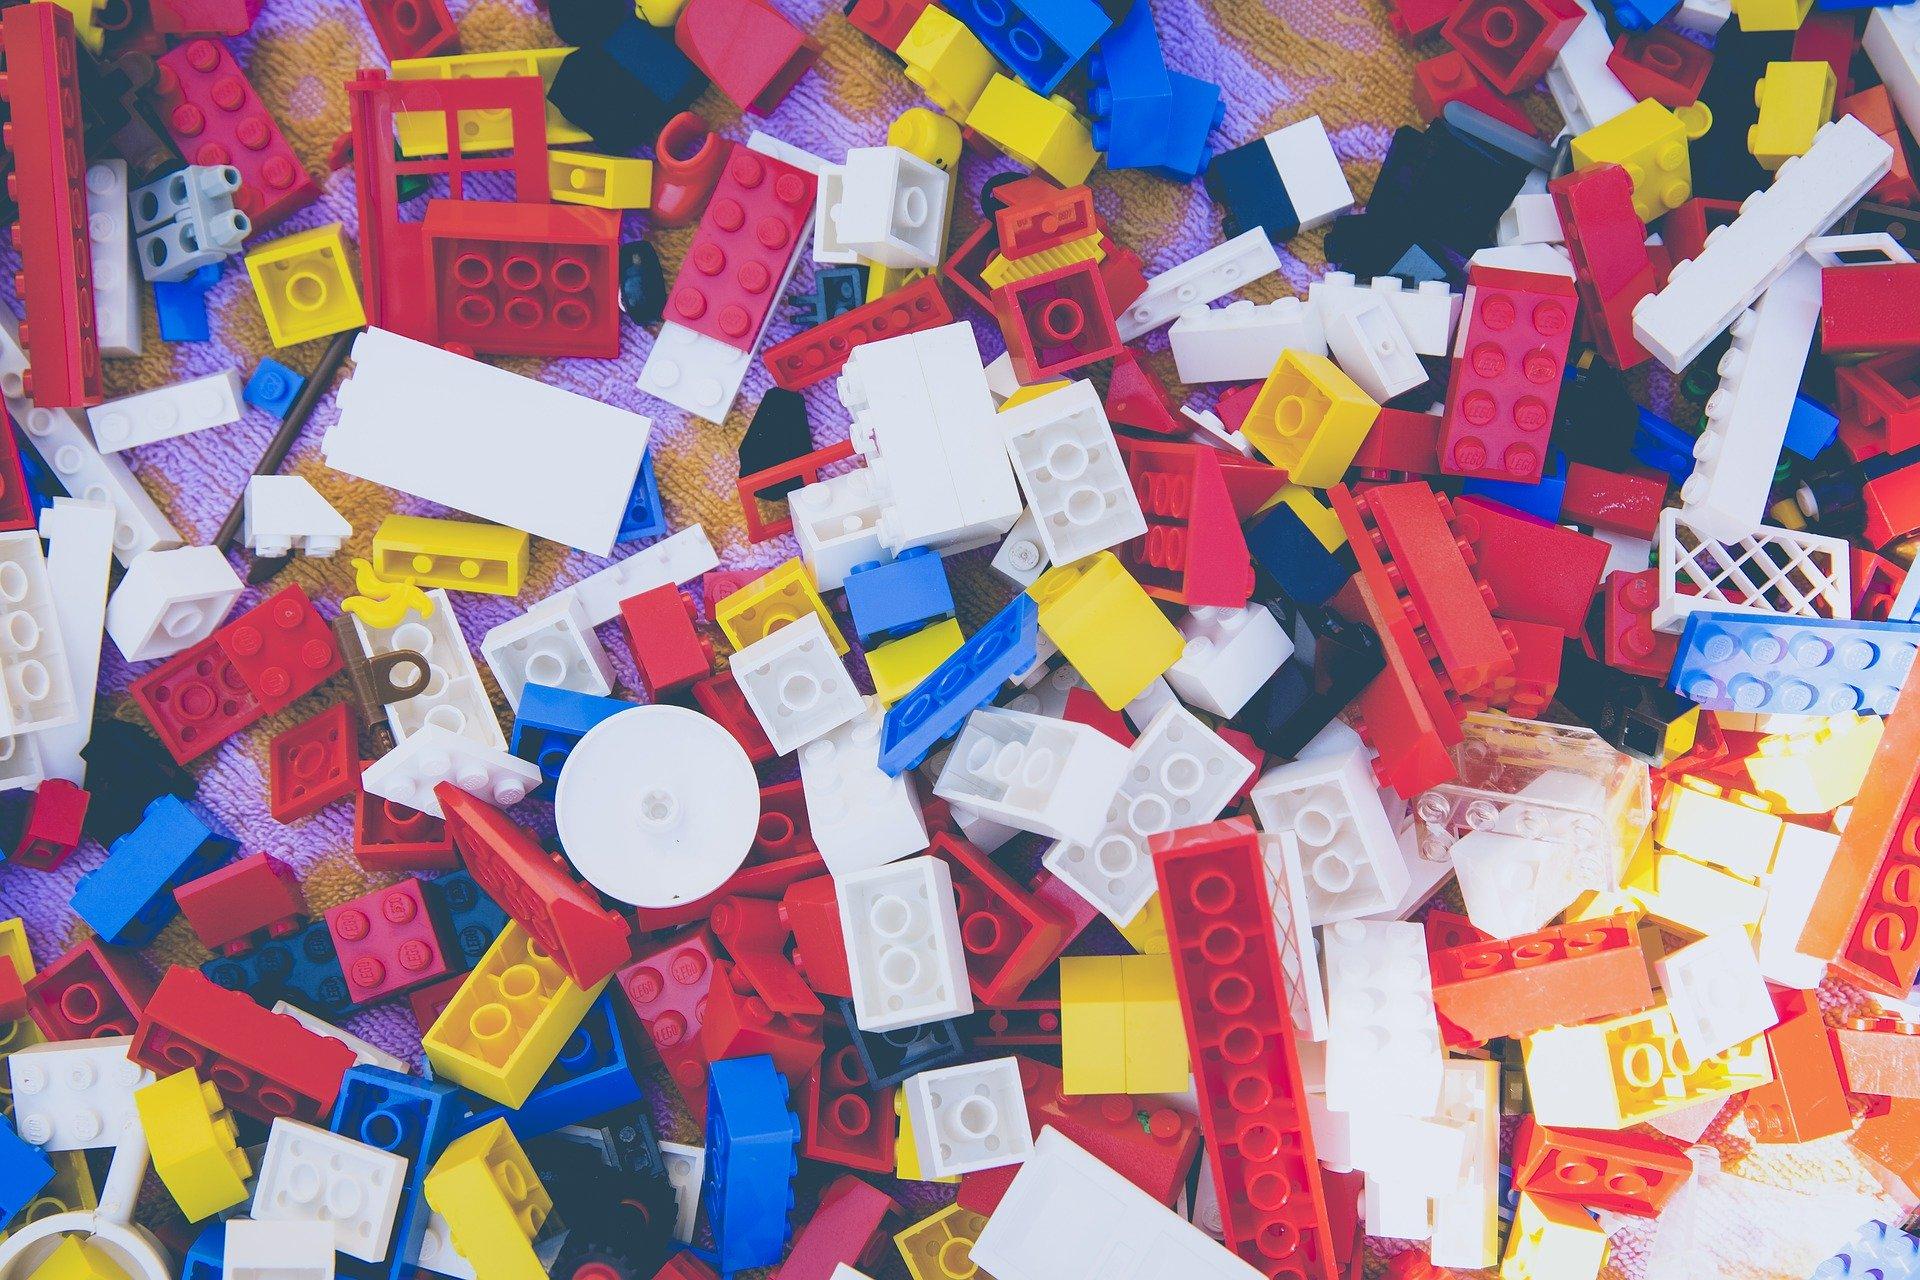 Obrázek: Mezinárodní kruh zločinců obchoduje skostkami stavebnice LEGO